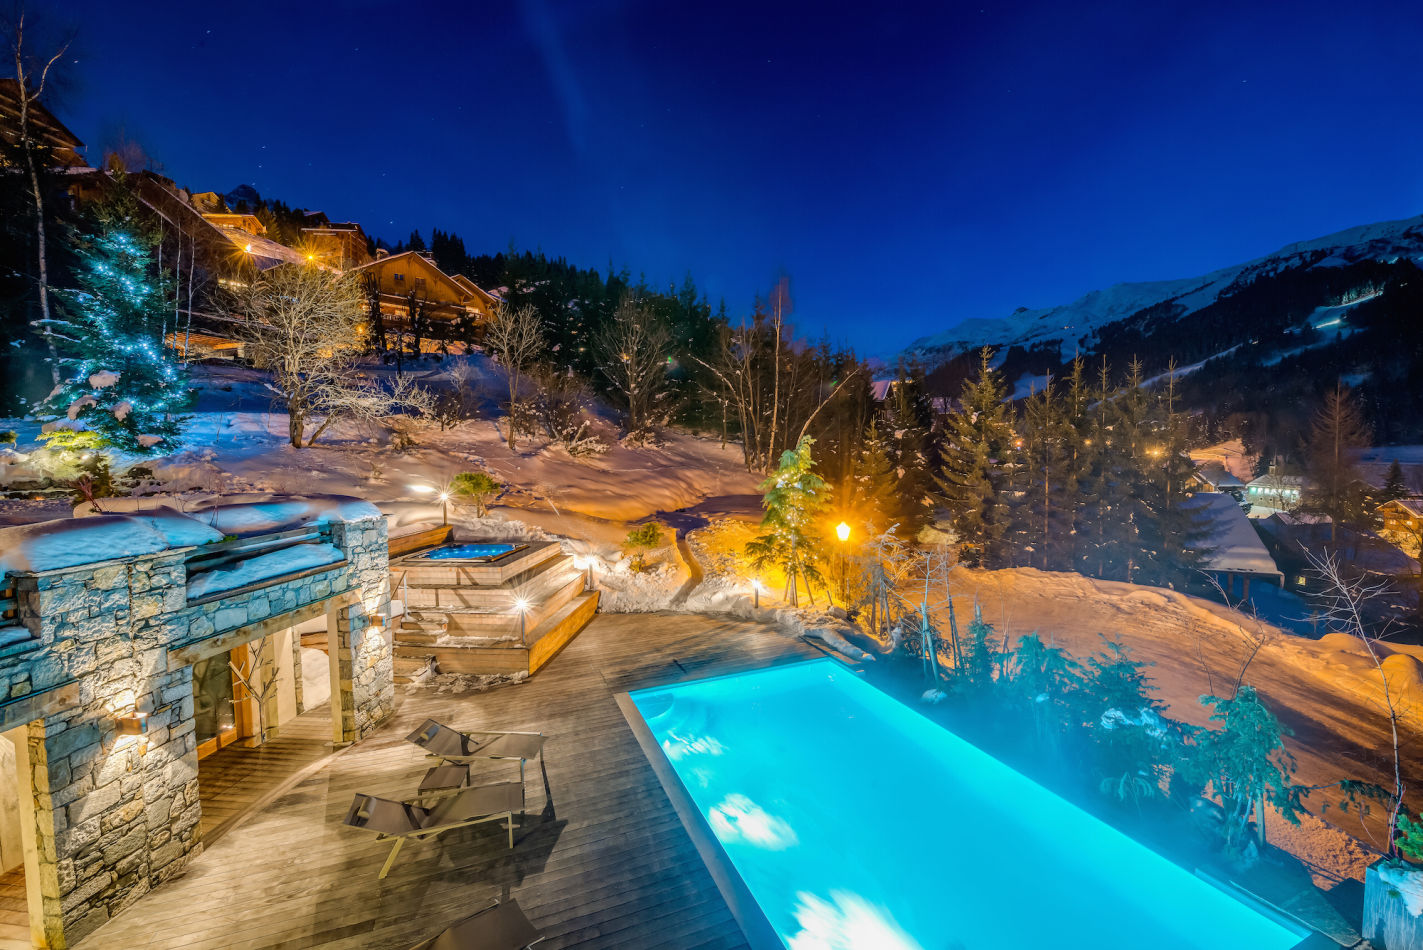 mt-exterior-pool-night